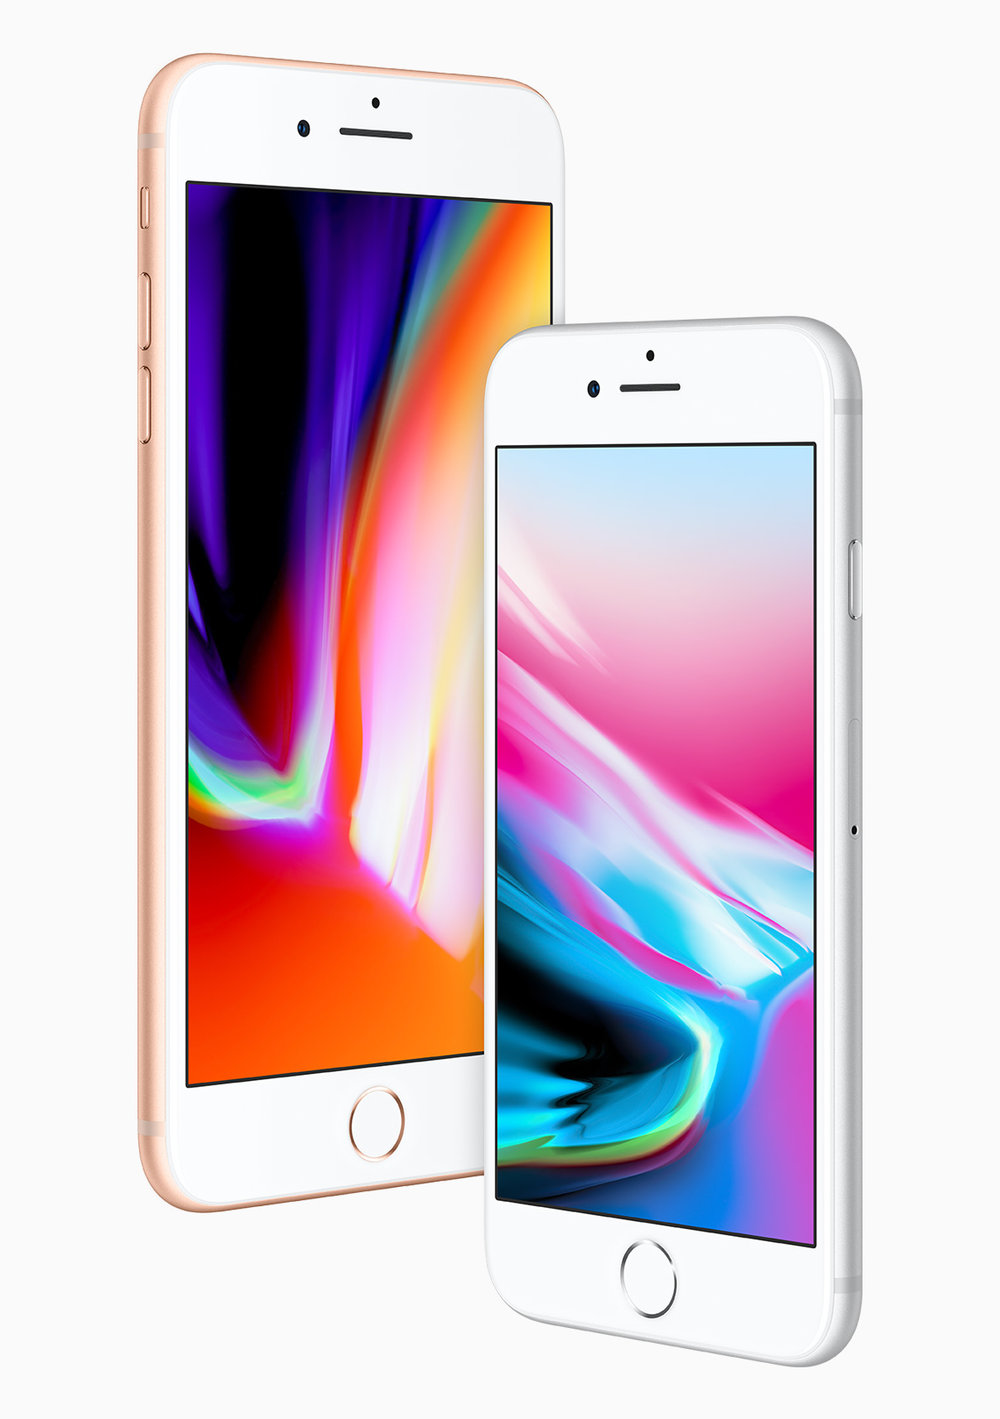 iPhone 8 via  Apple.com